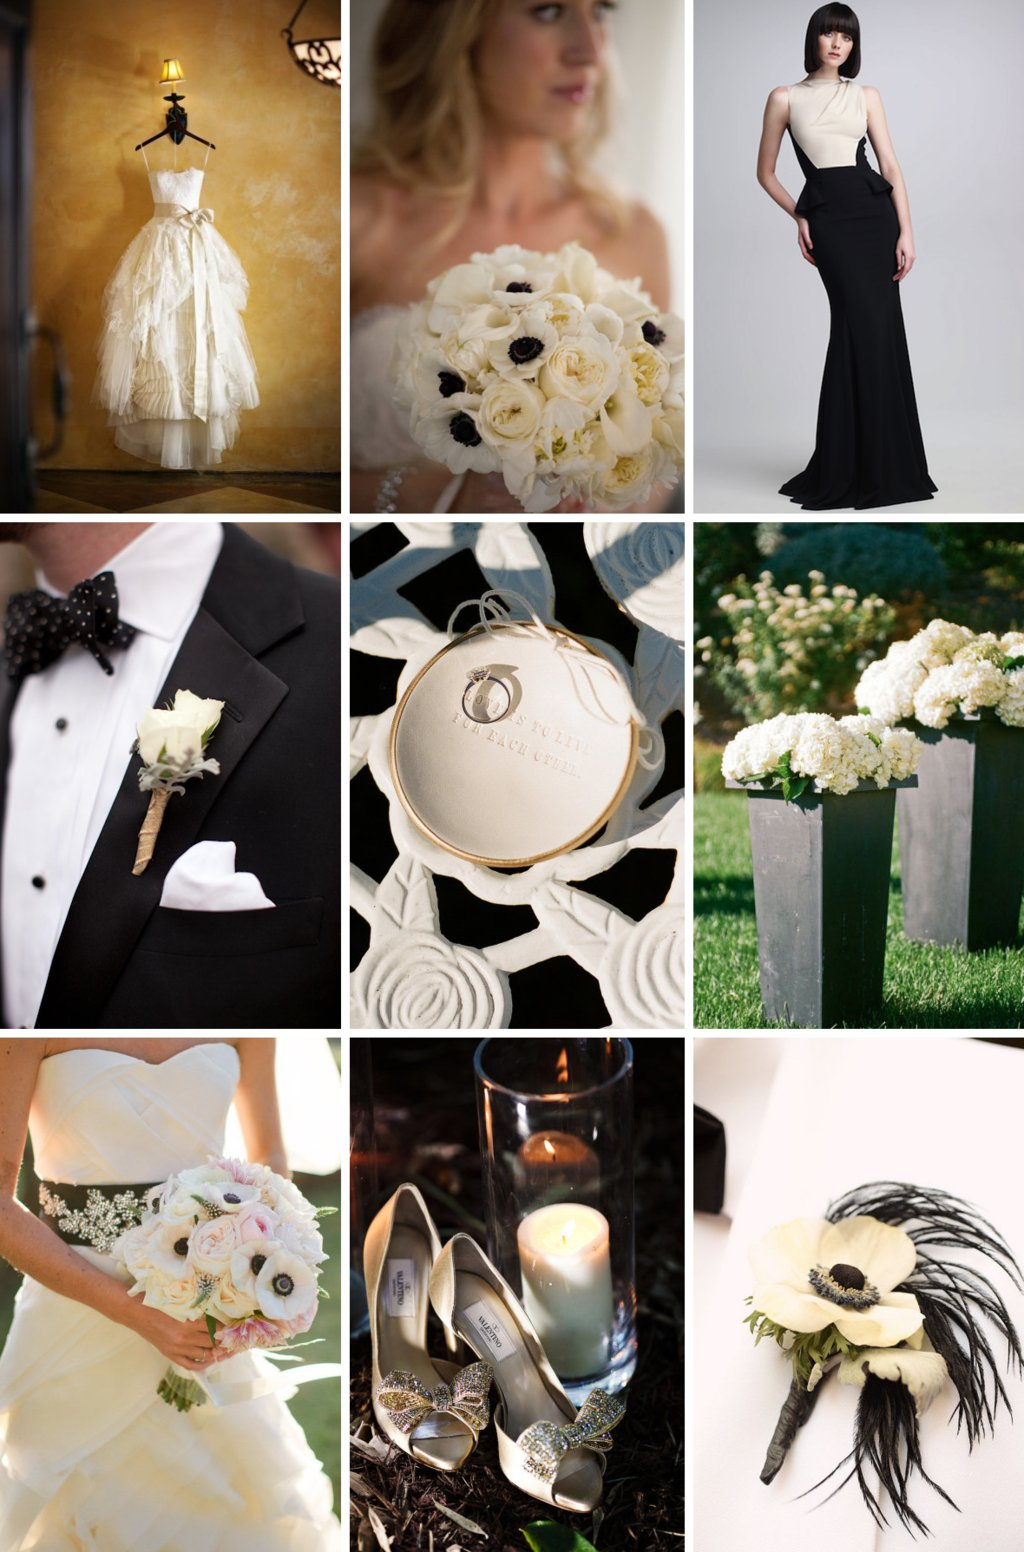 Elegant-black-tie-wedding-remix-buttercream-and-black-color-palette.full